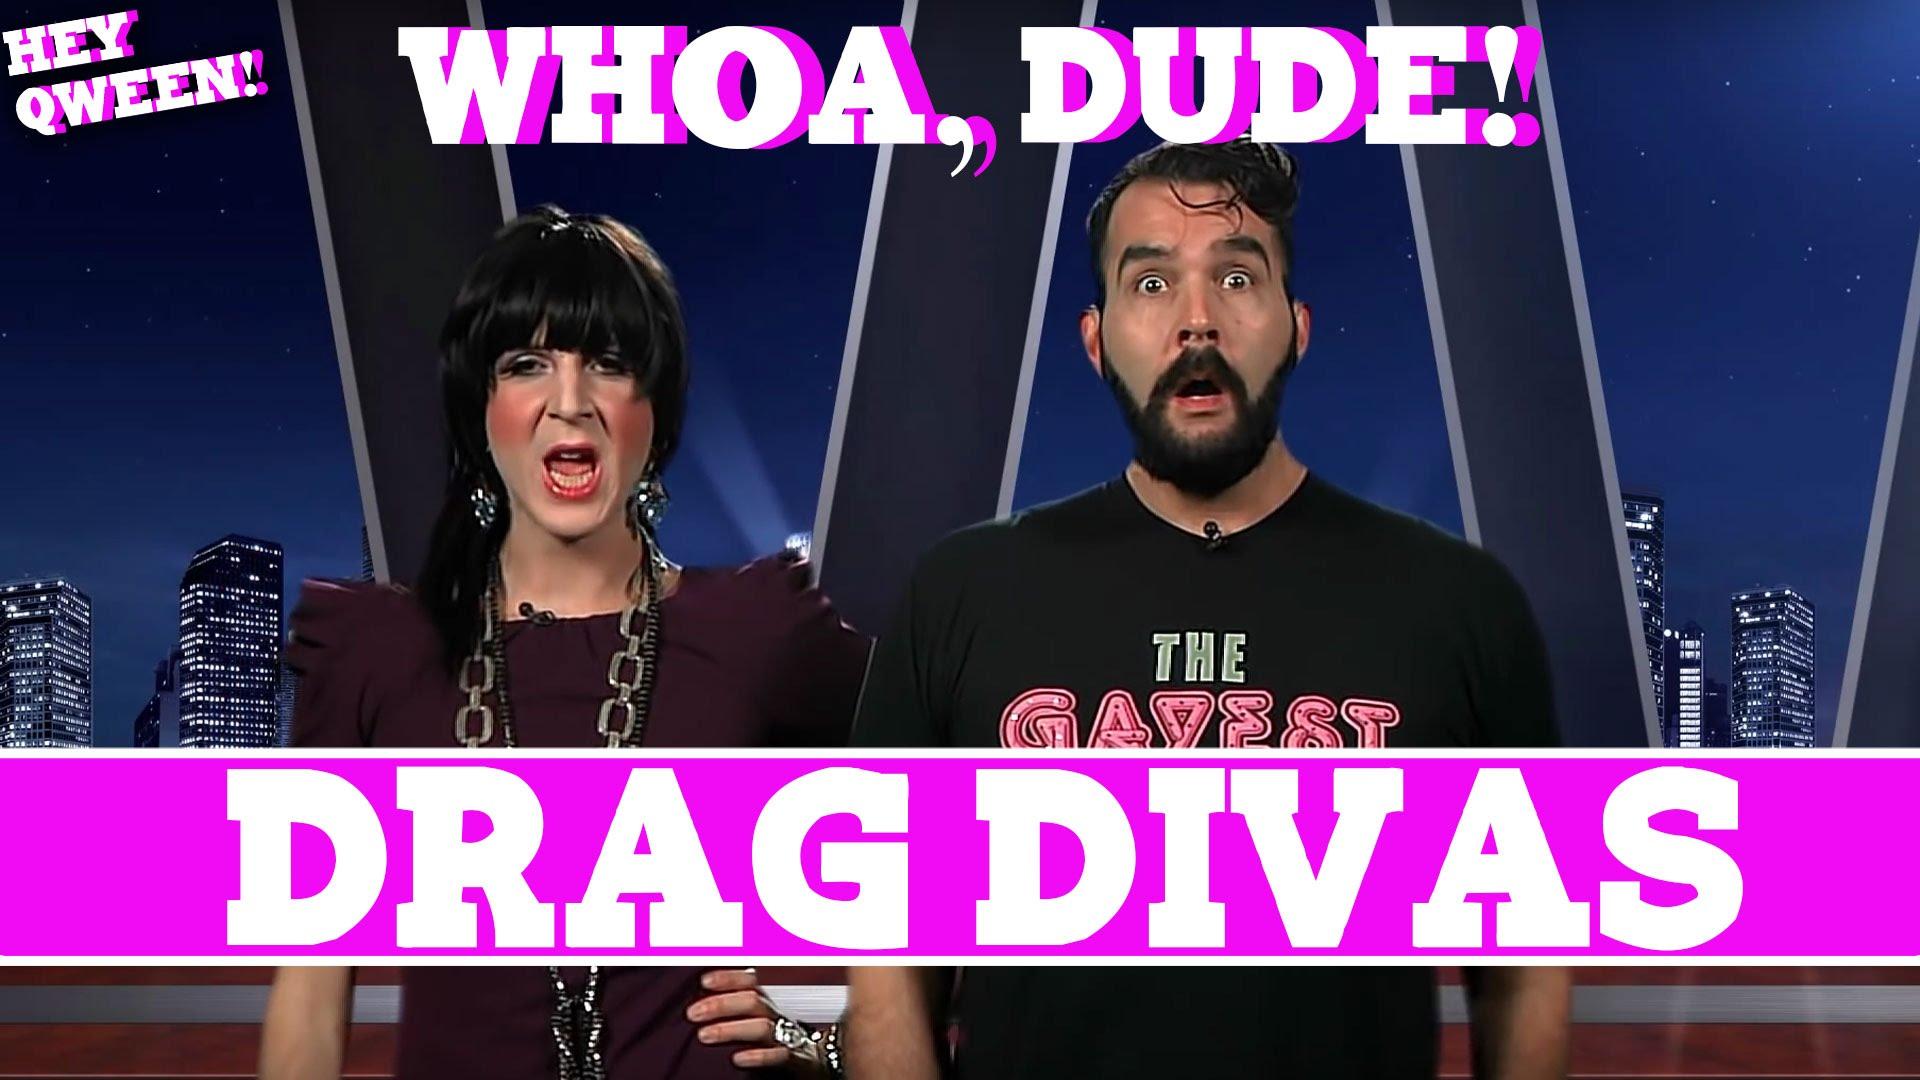 Whoa, Dude! Drag Divas, Episode 105